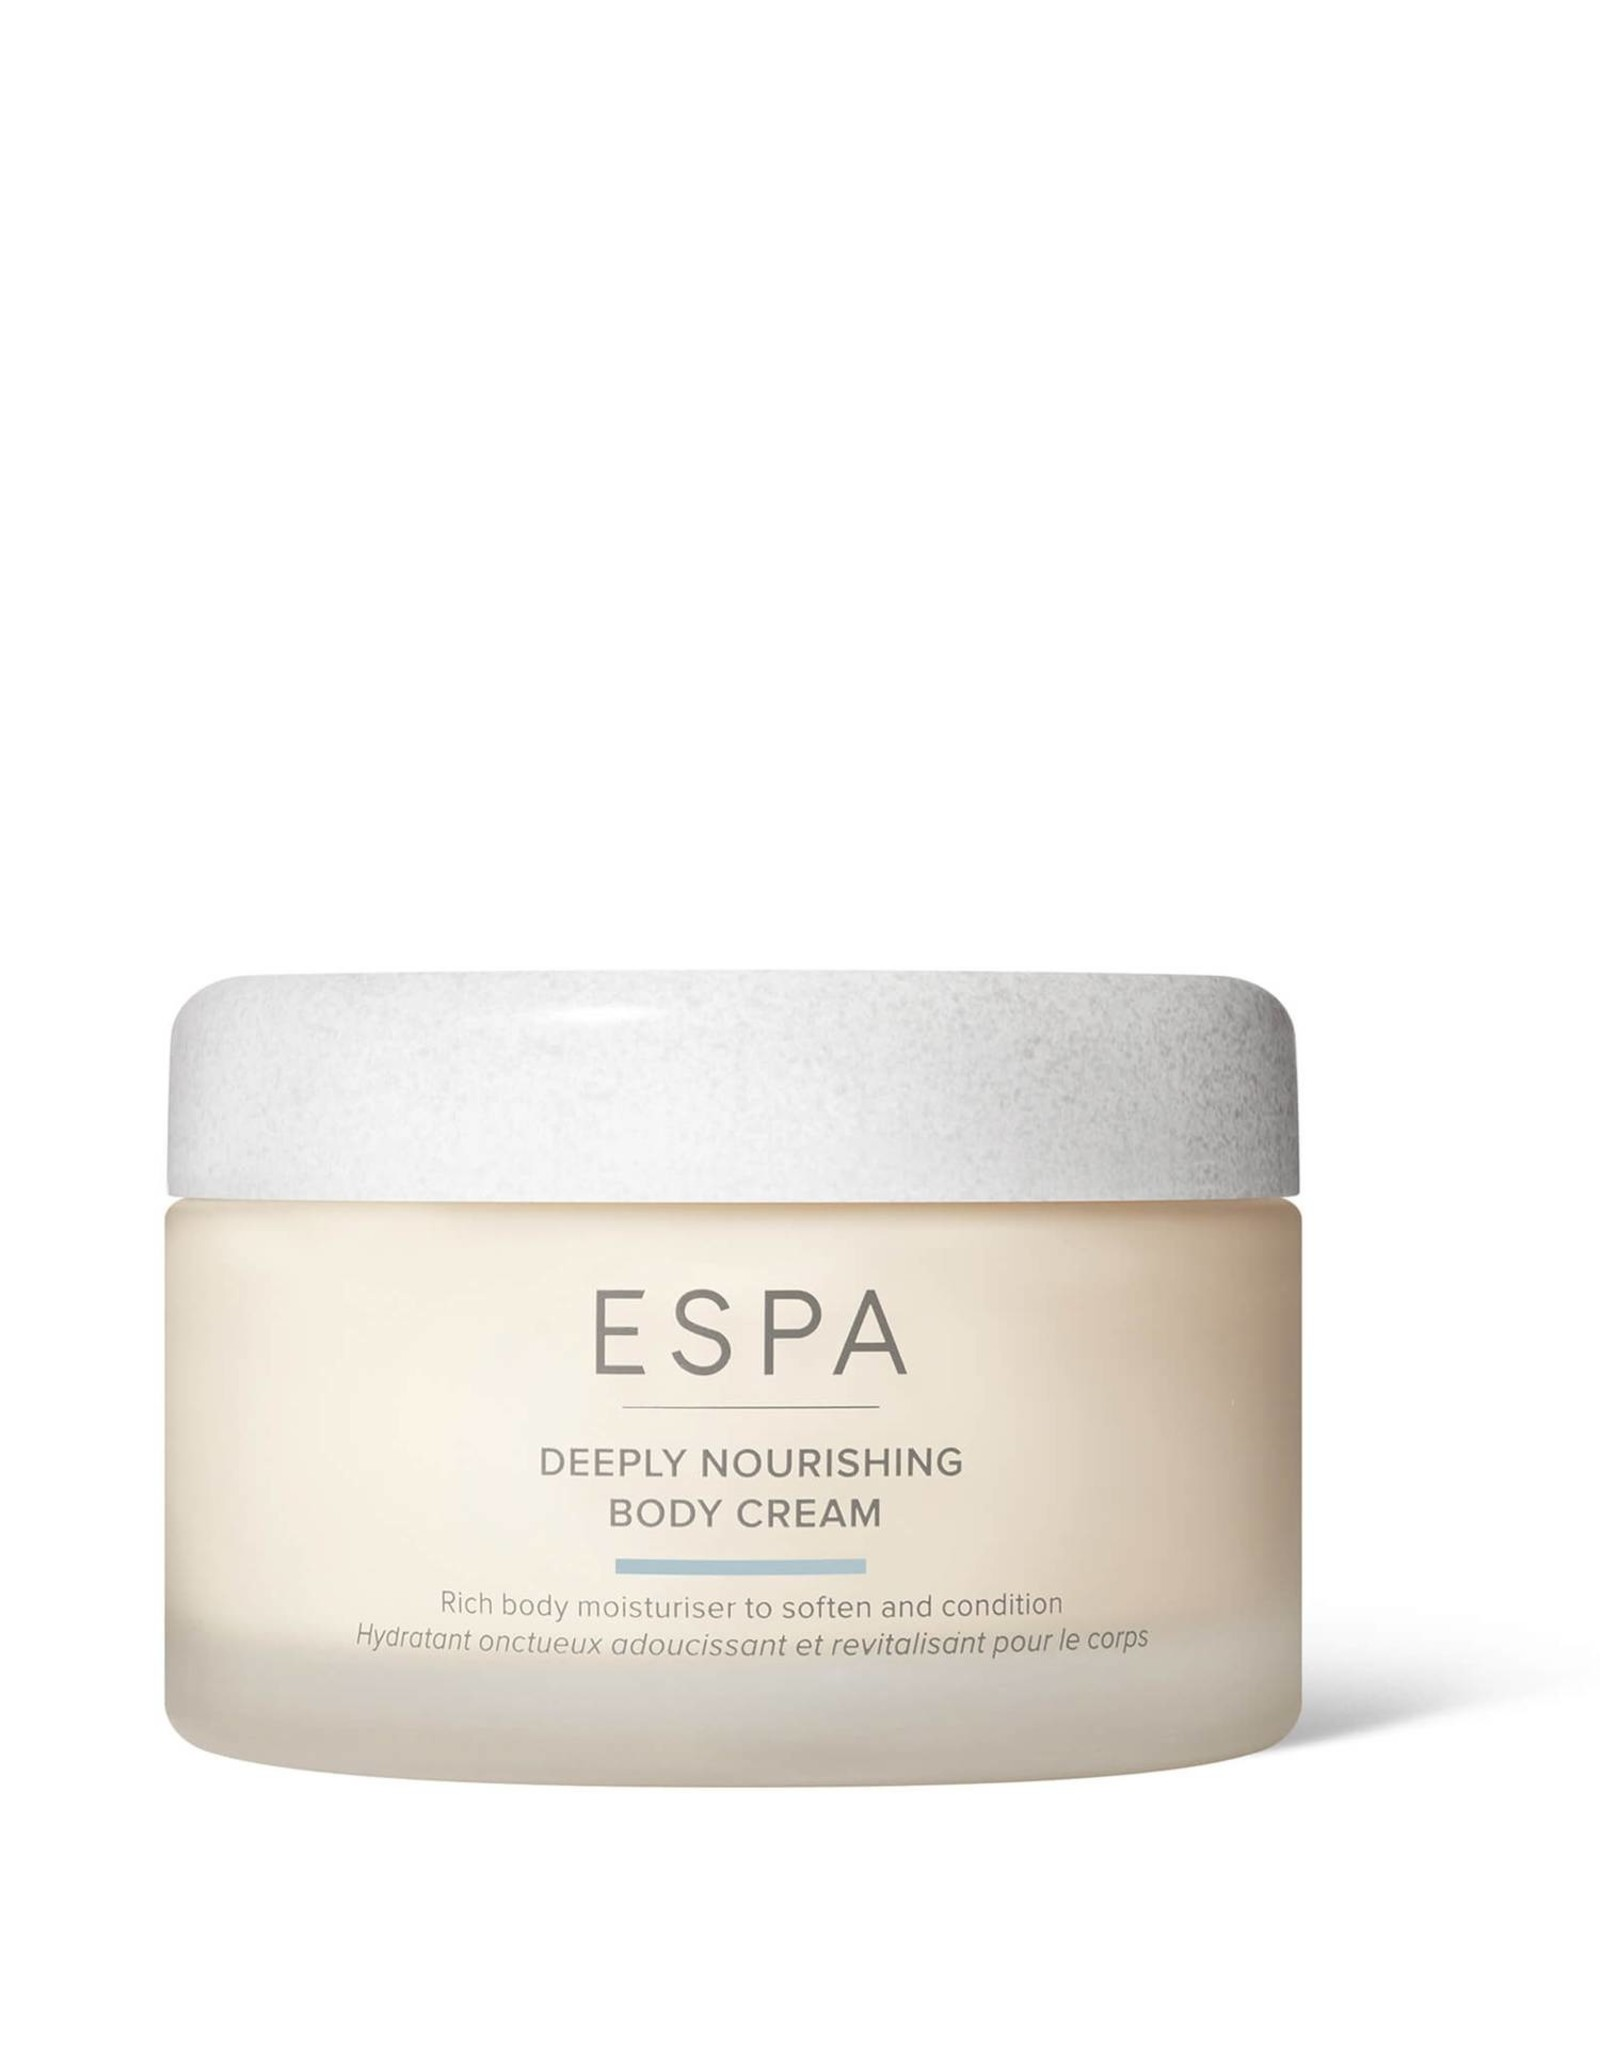 ESPA Deeply Nourishing Body Cream, 180ml